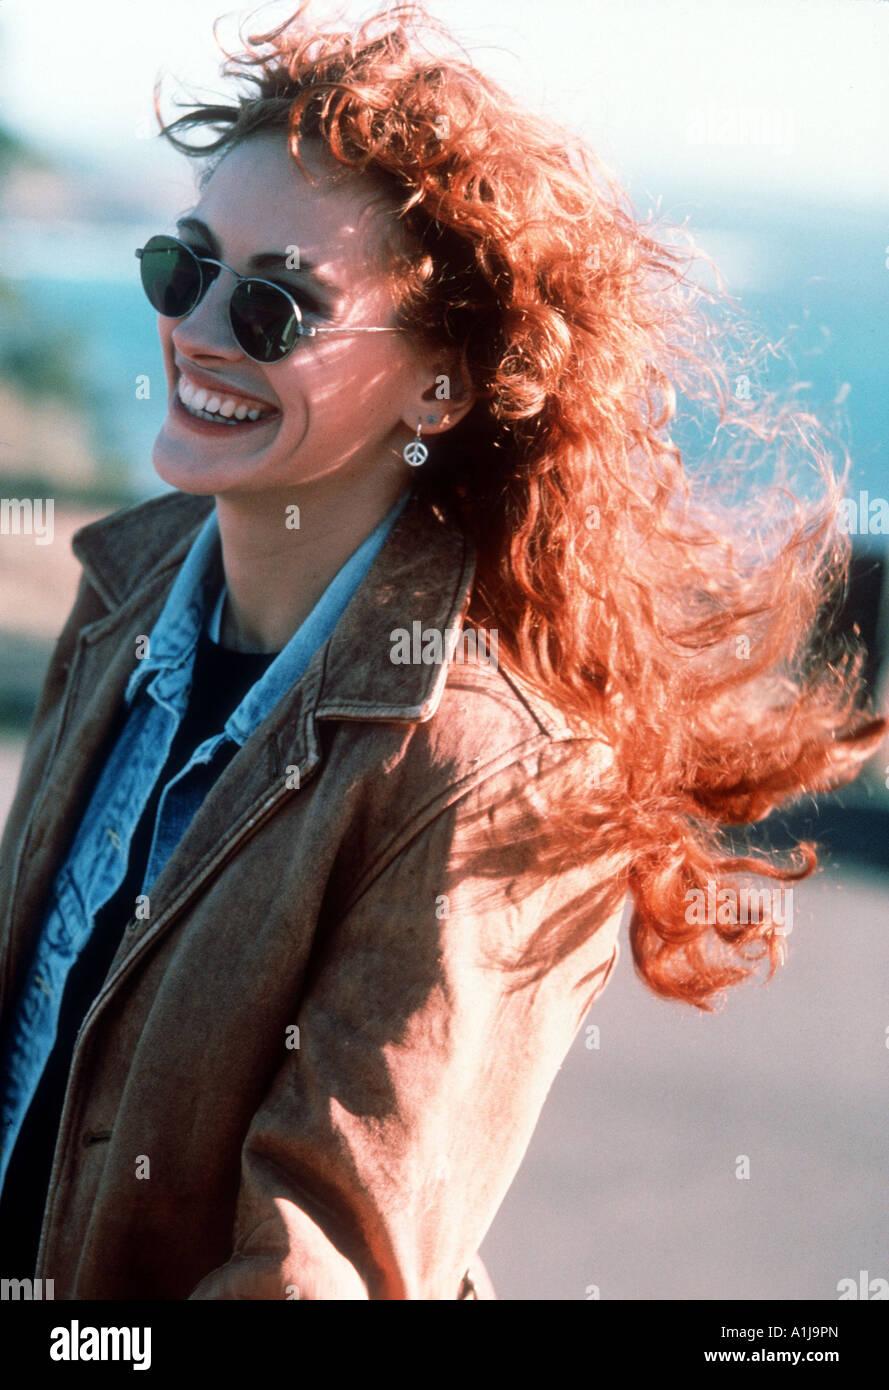 Dying Young Year 1991 Director Joel Schumacher Julia Roberts